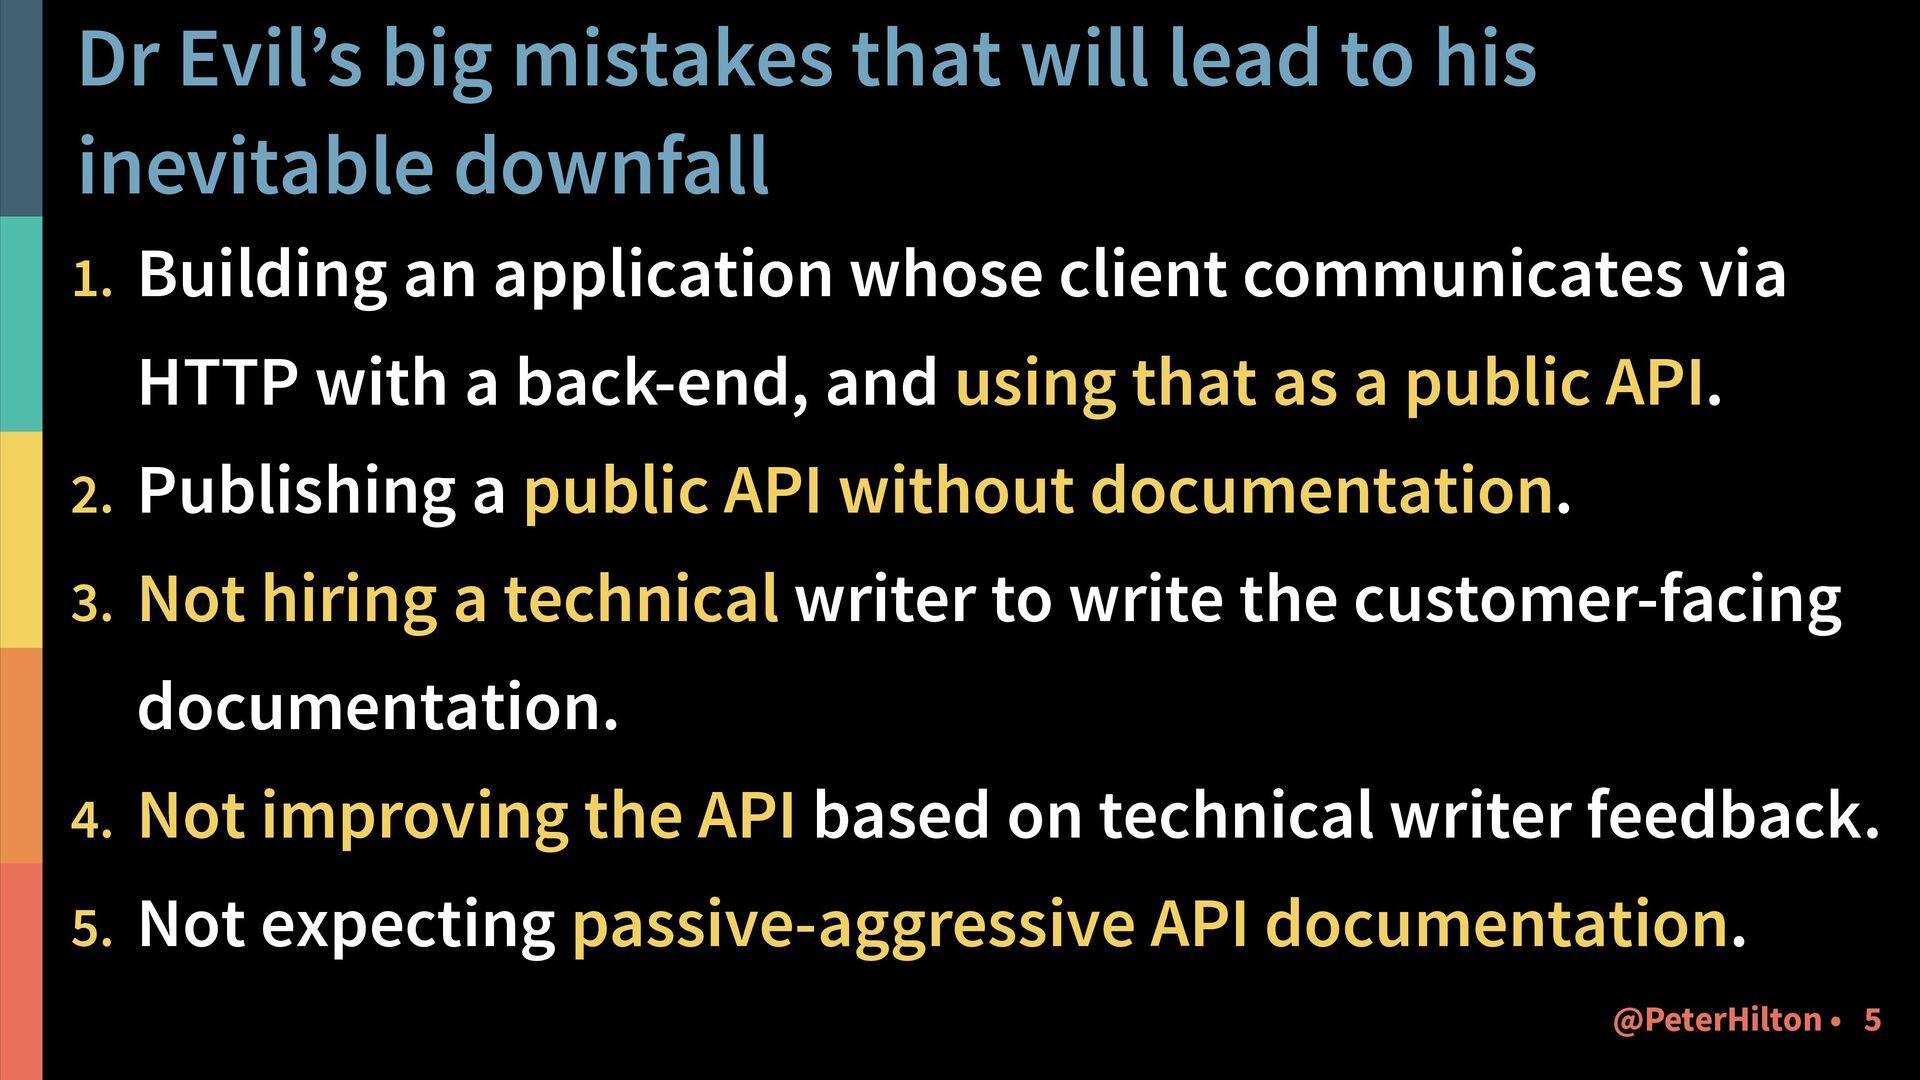 Dr Evil's big mistakes